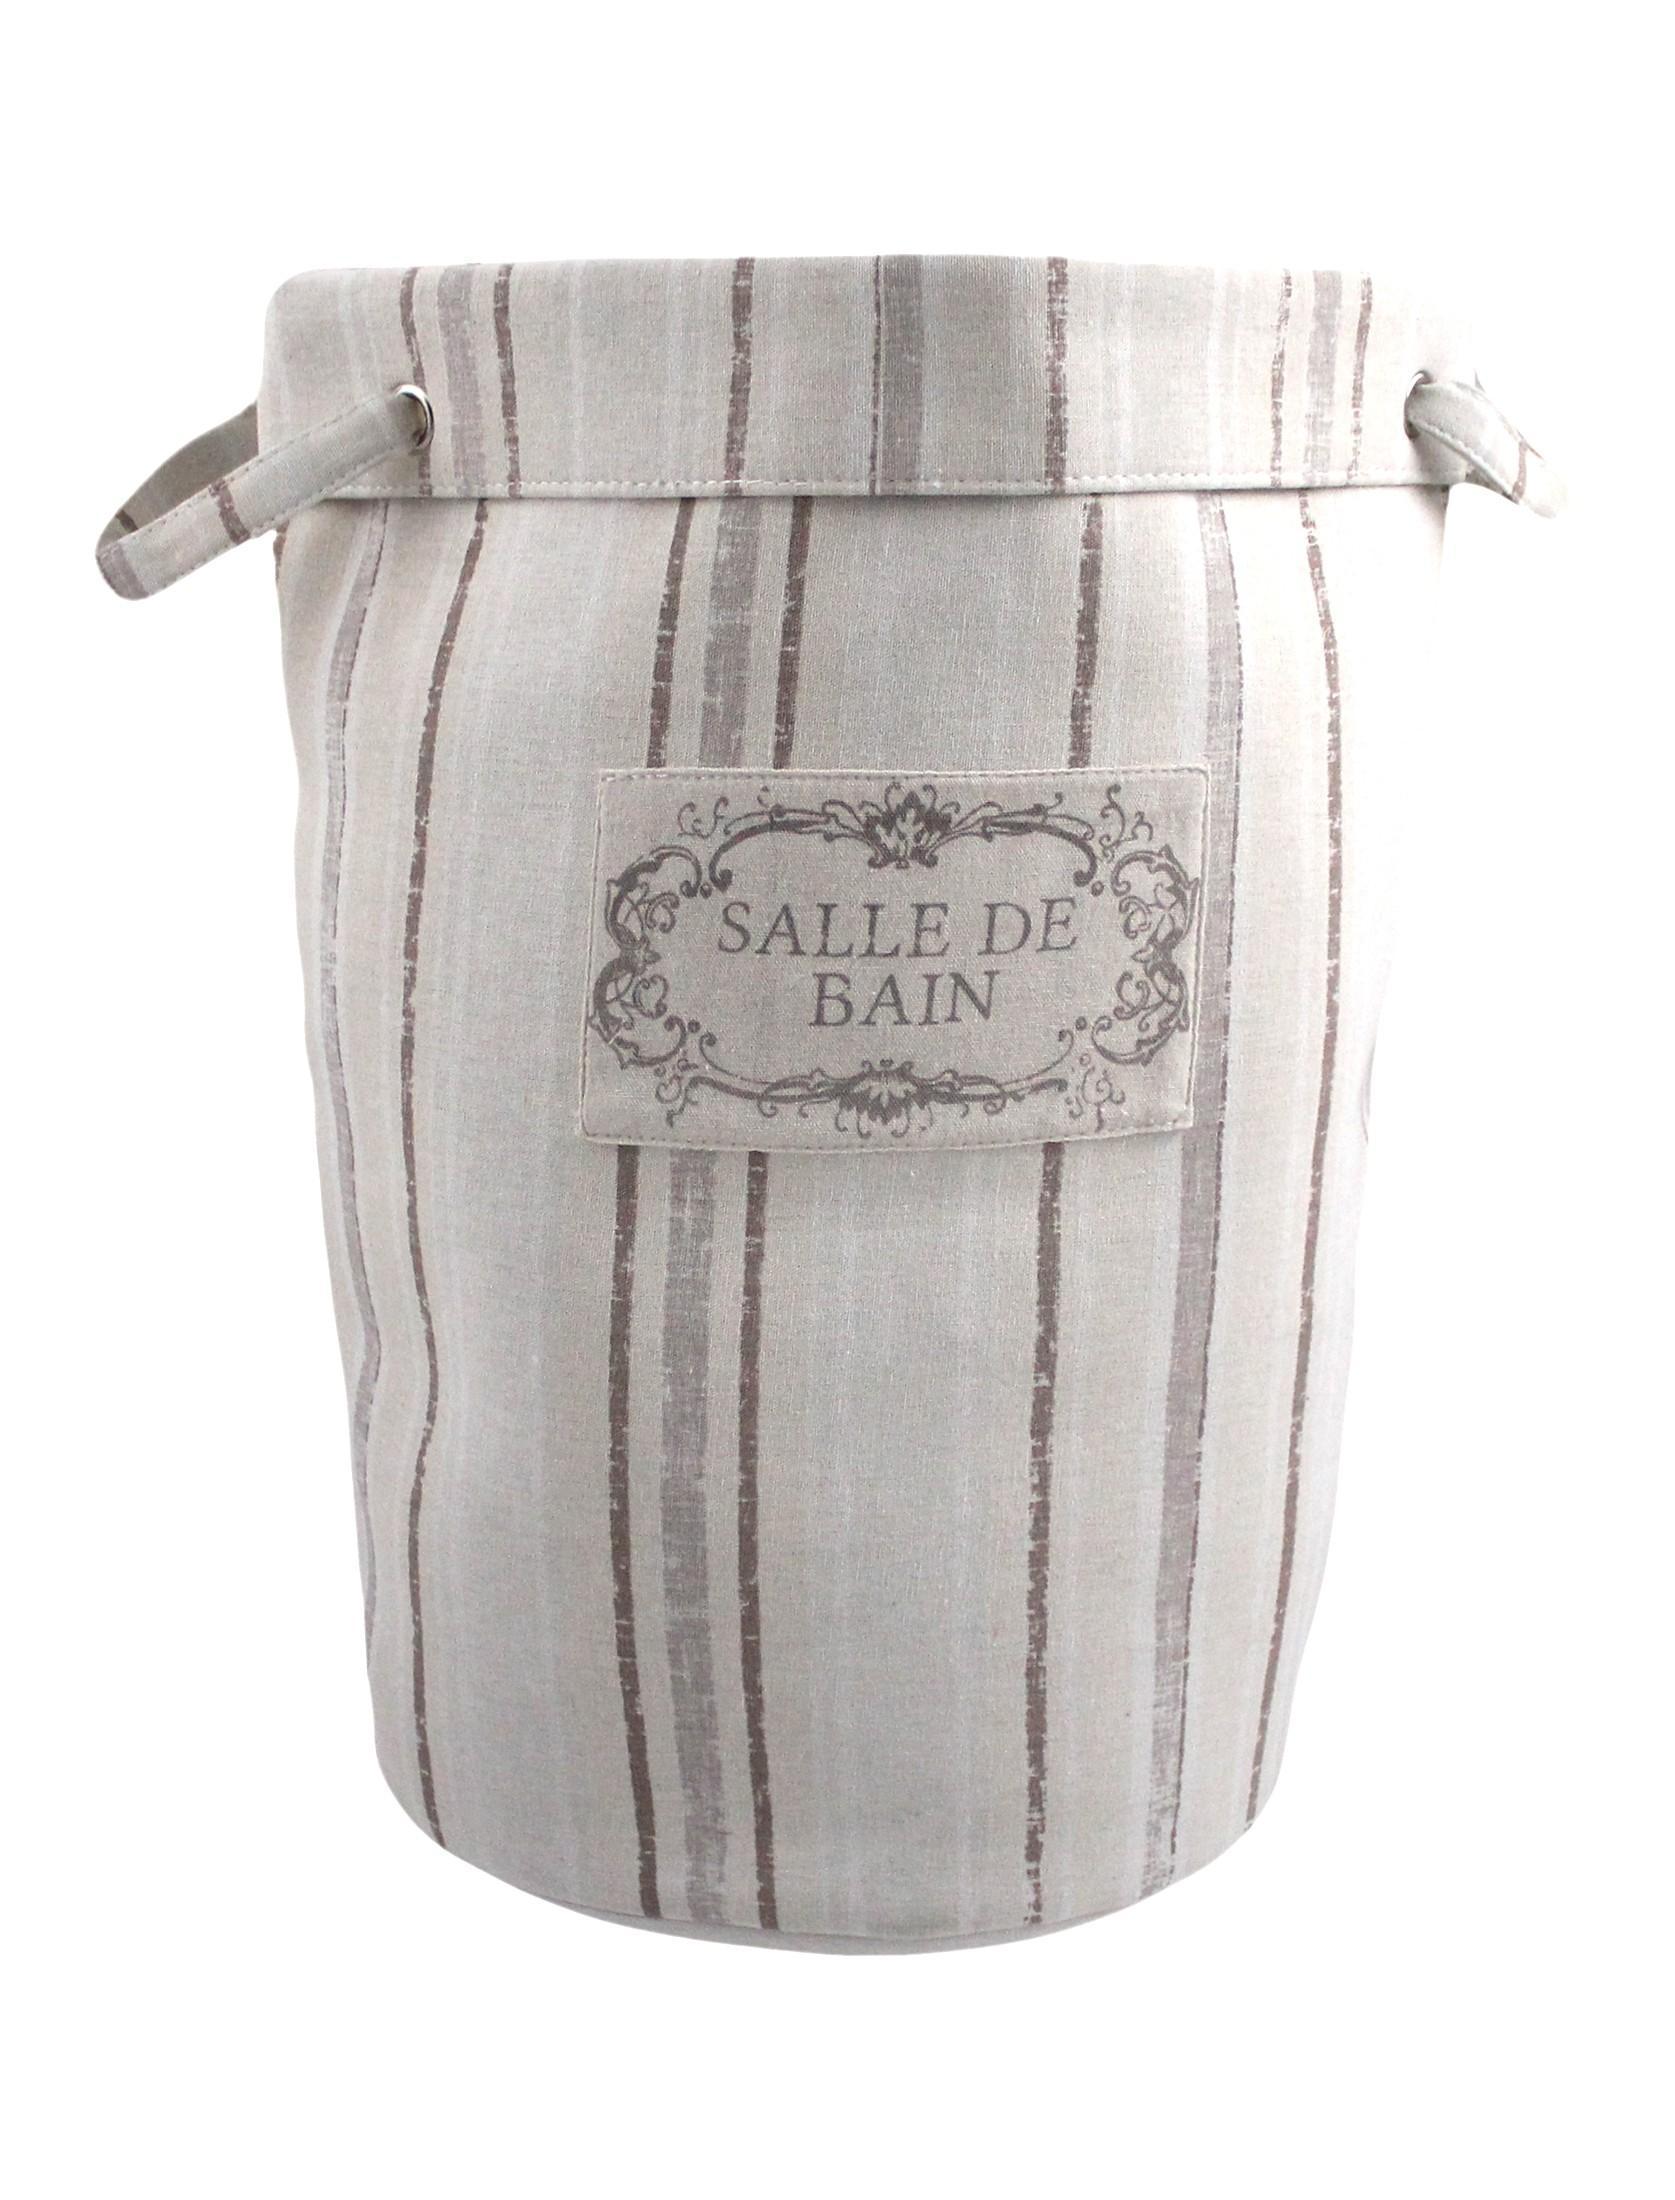 Salle De Bain Washroom ~ salle de bain bathroom laundry bag ponden home